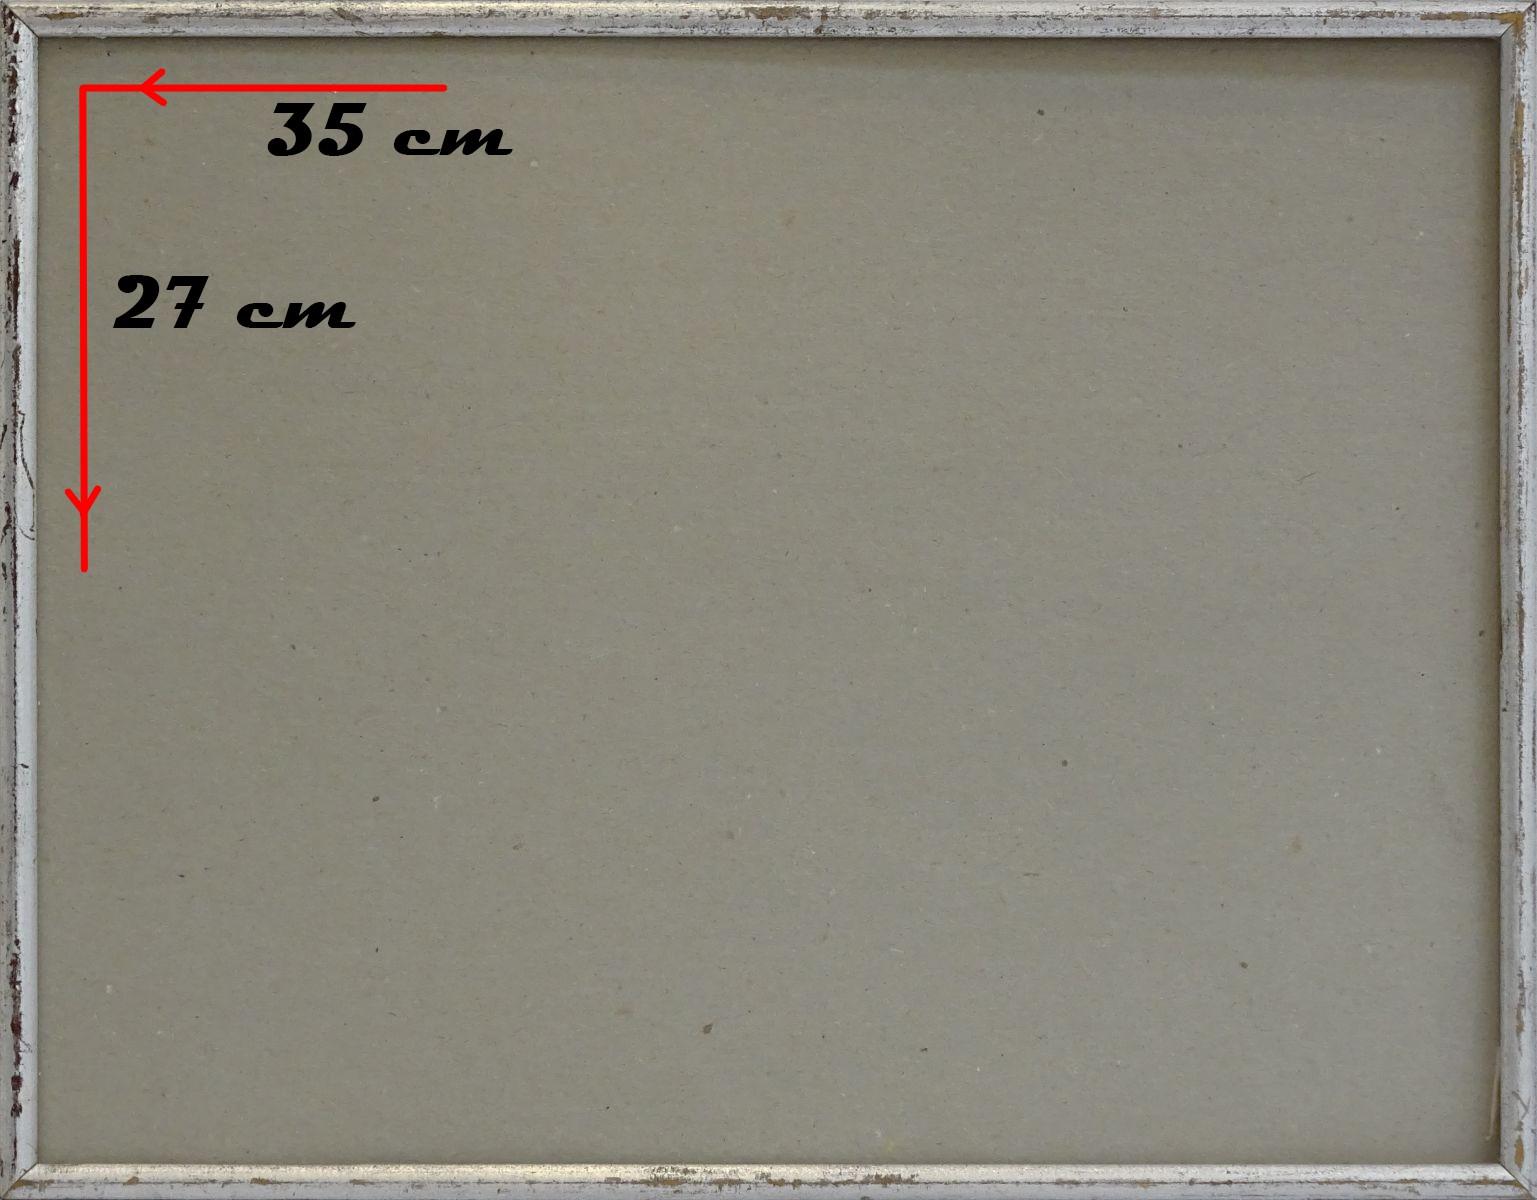 DSC09109.JPG (1537�1200)